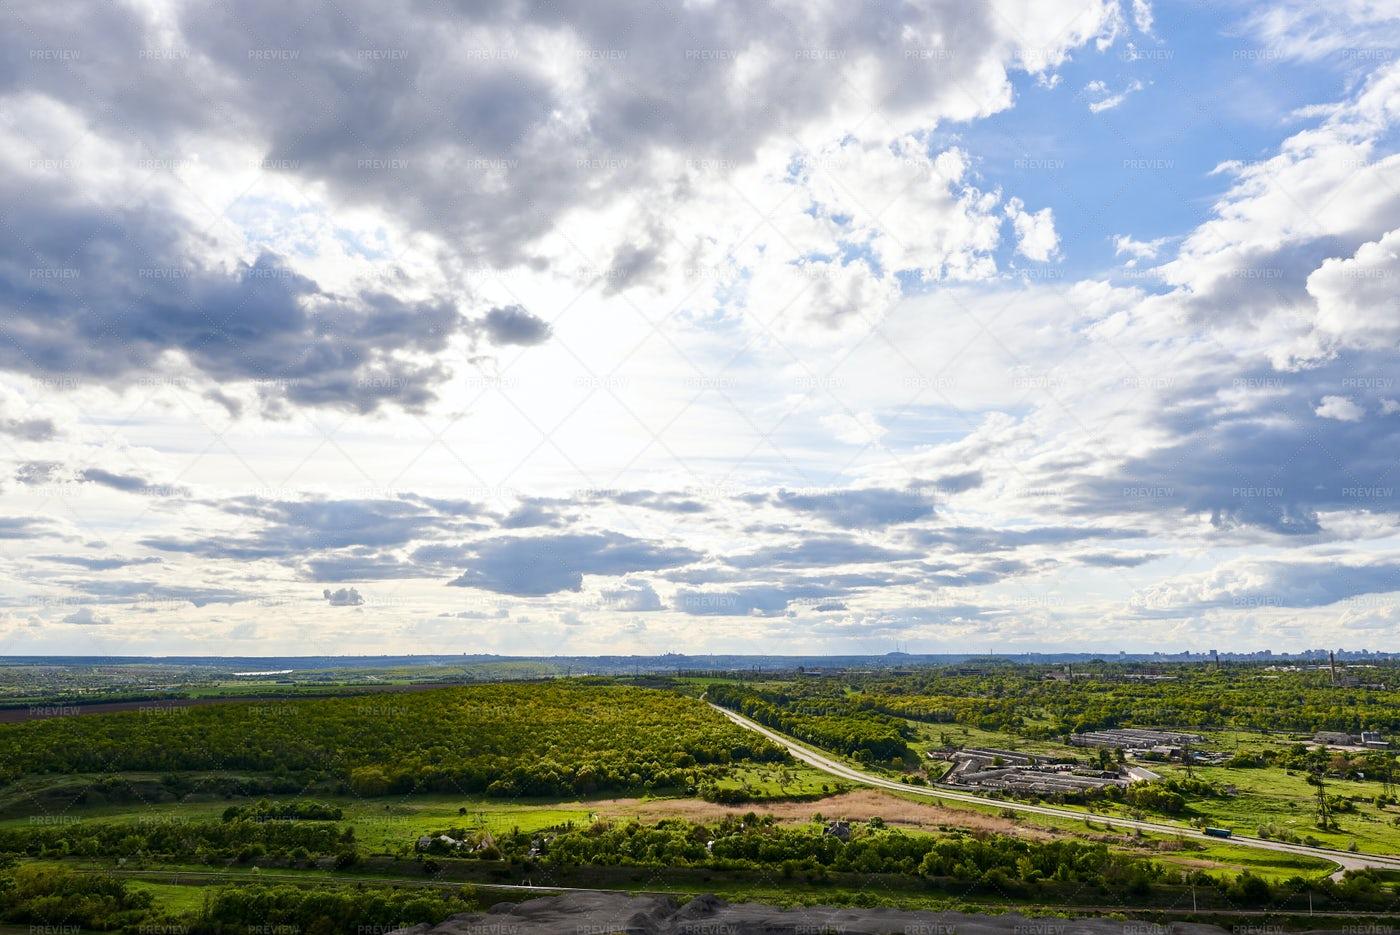 Cloudy Sky Over The Fields: Stock Photos